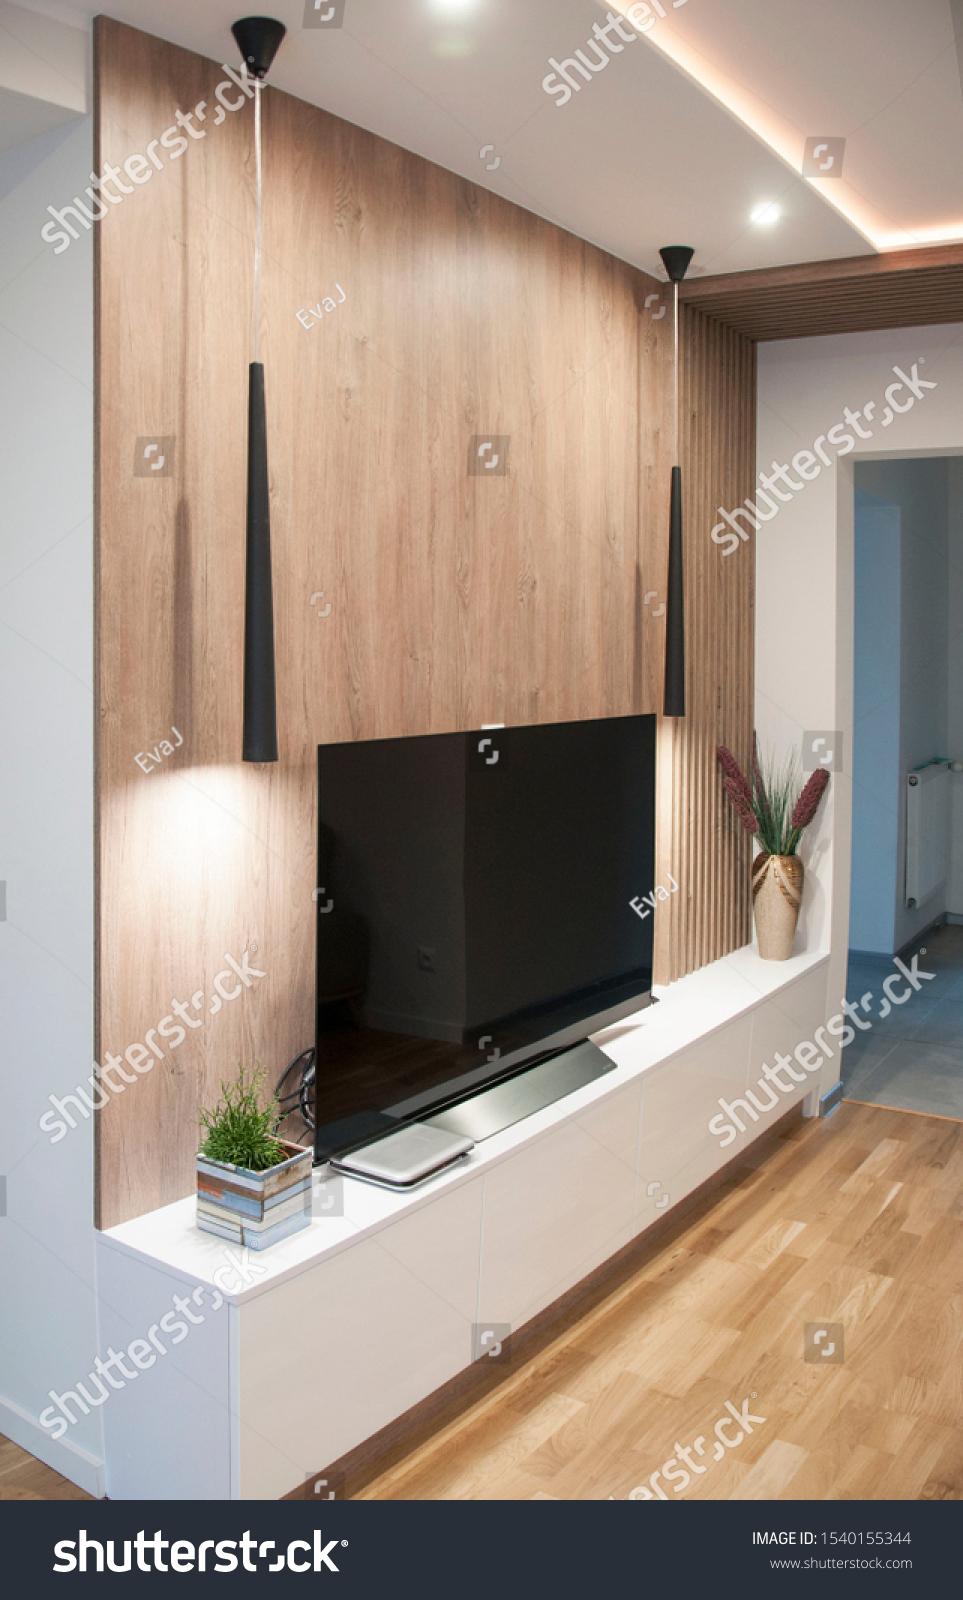 Tv Set On Background Wooden Professionally Editar Agora Foto Stock 1540155344